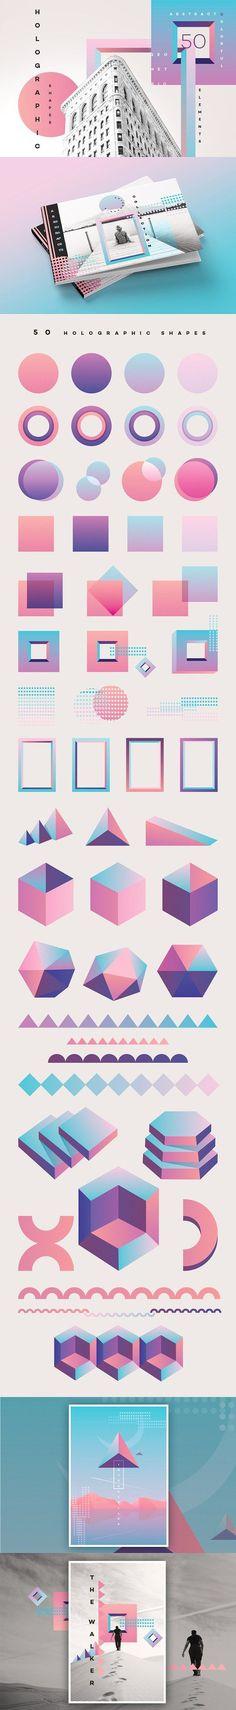 50 Holographic Shapes by Polar Vectors on @creativemarket Shape Design, 90s Design, Pink Design, Retro Design, Design Social, Modern Design, Graphic Design Invitation, Poster Design Layout, Graphic Design Branding